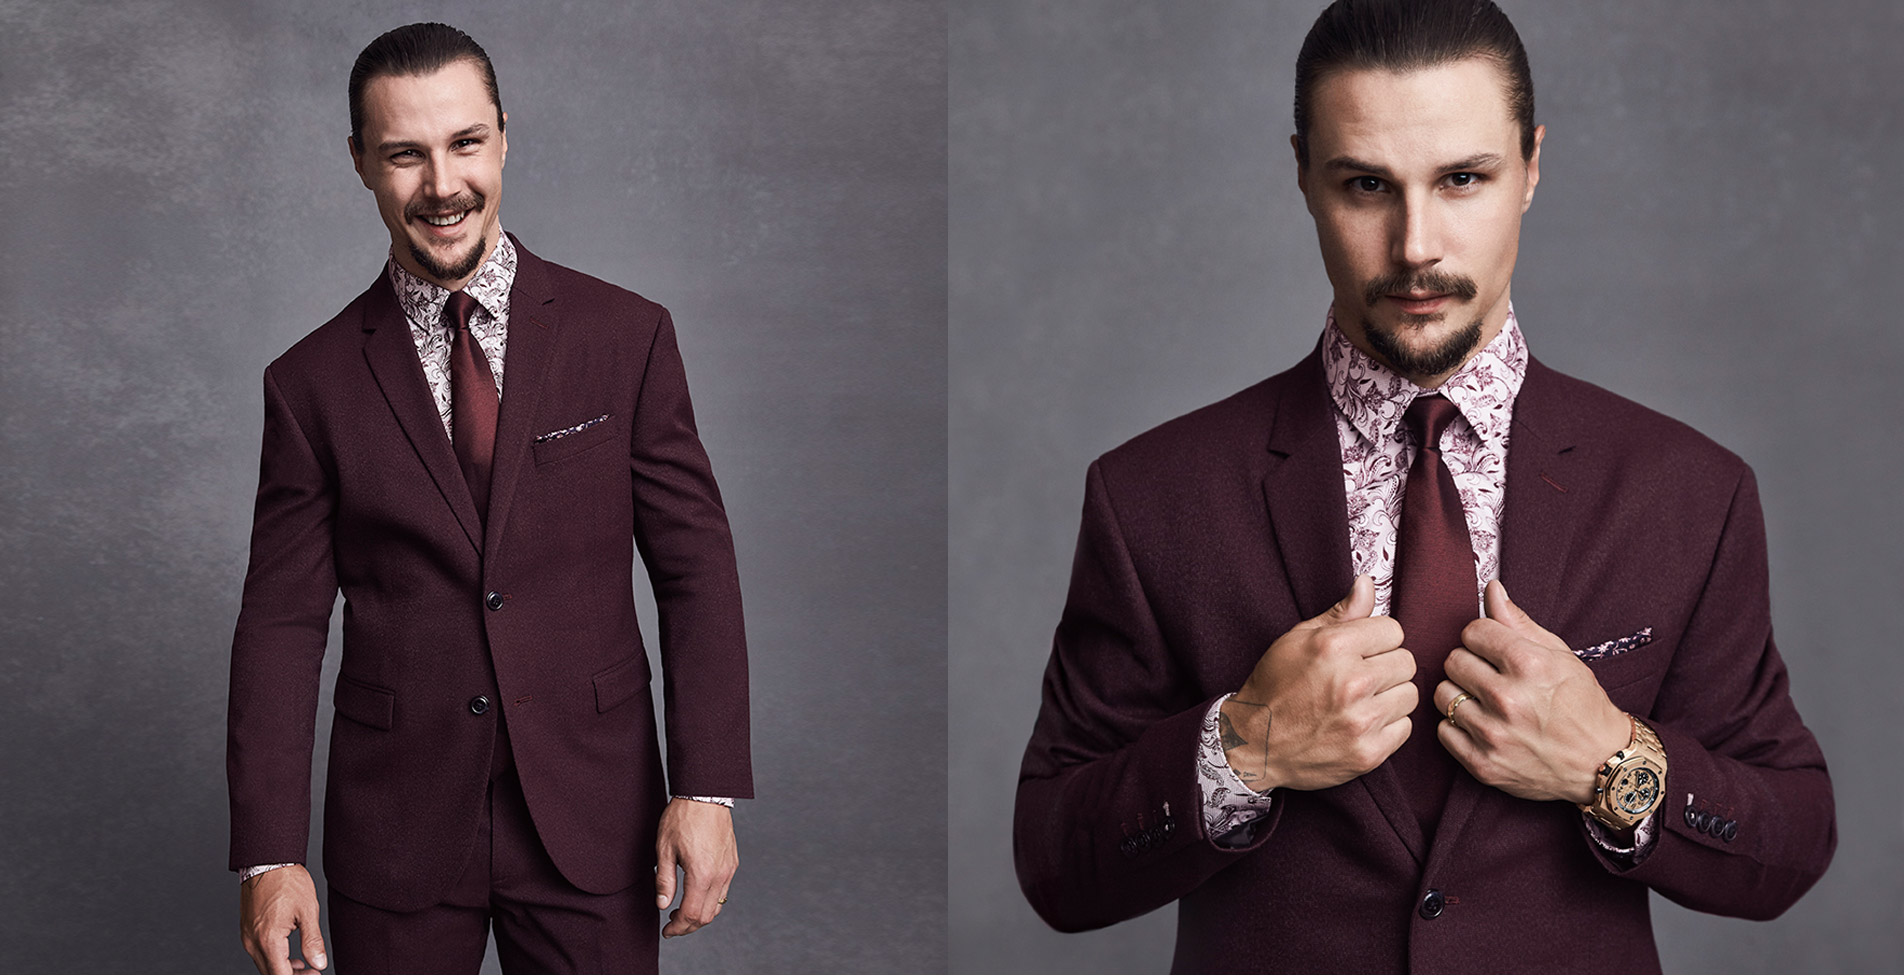 ERIK KARLSSON. One Man, Three Suits. Discover More!